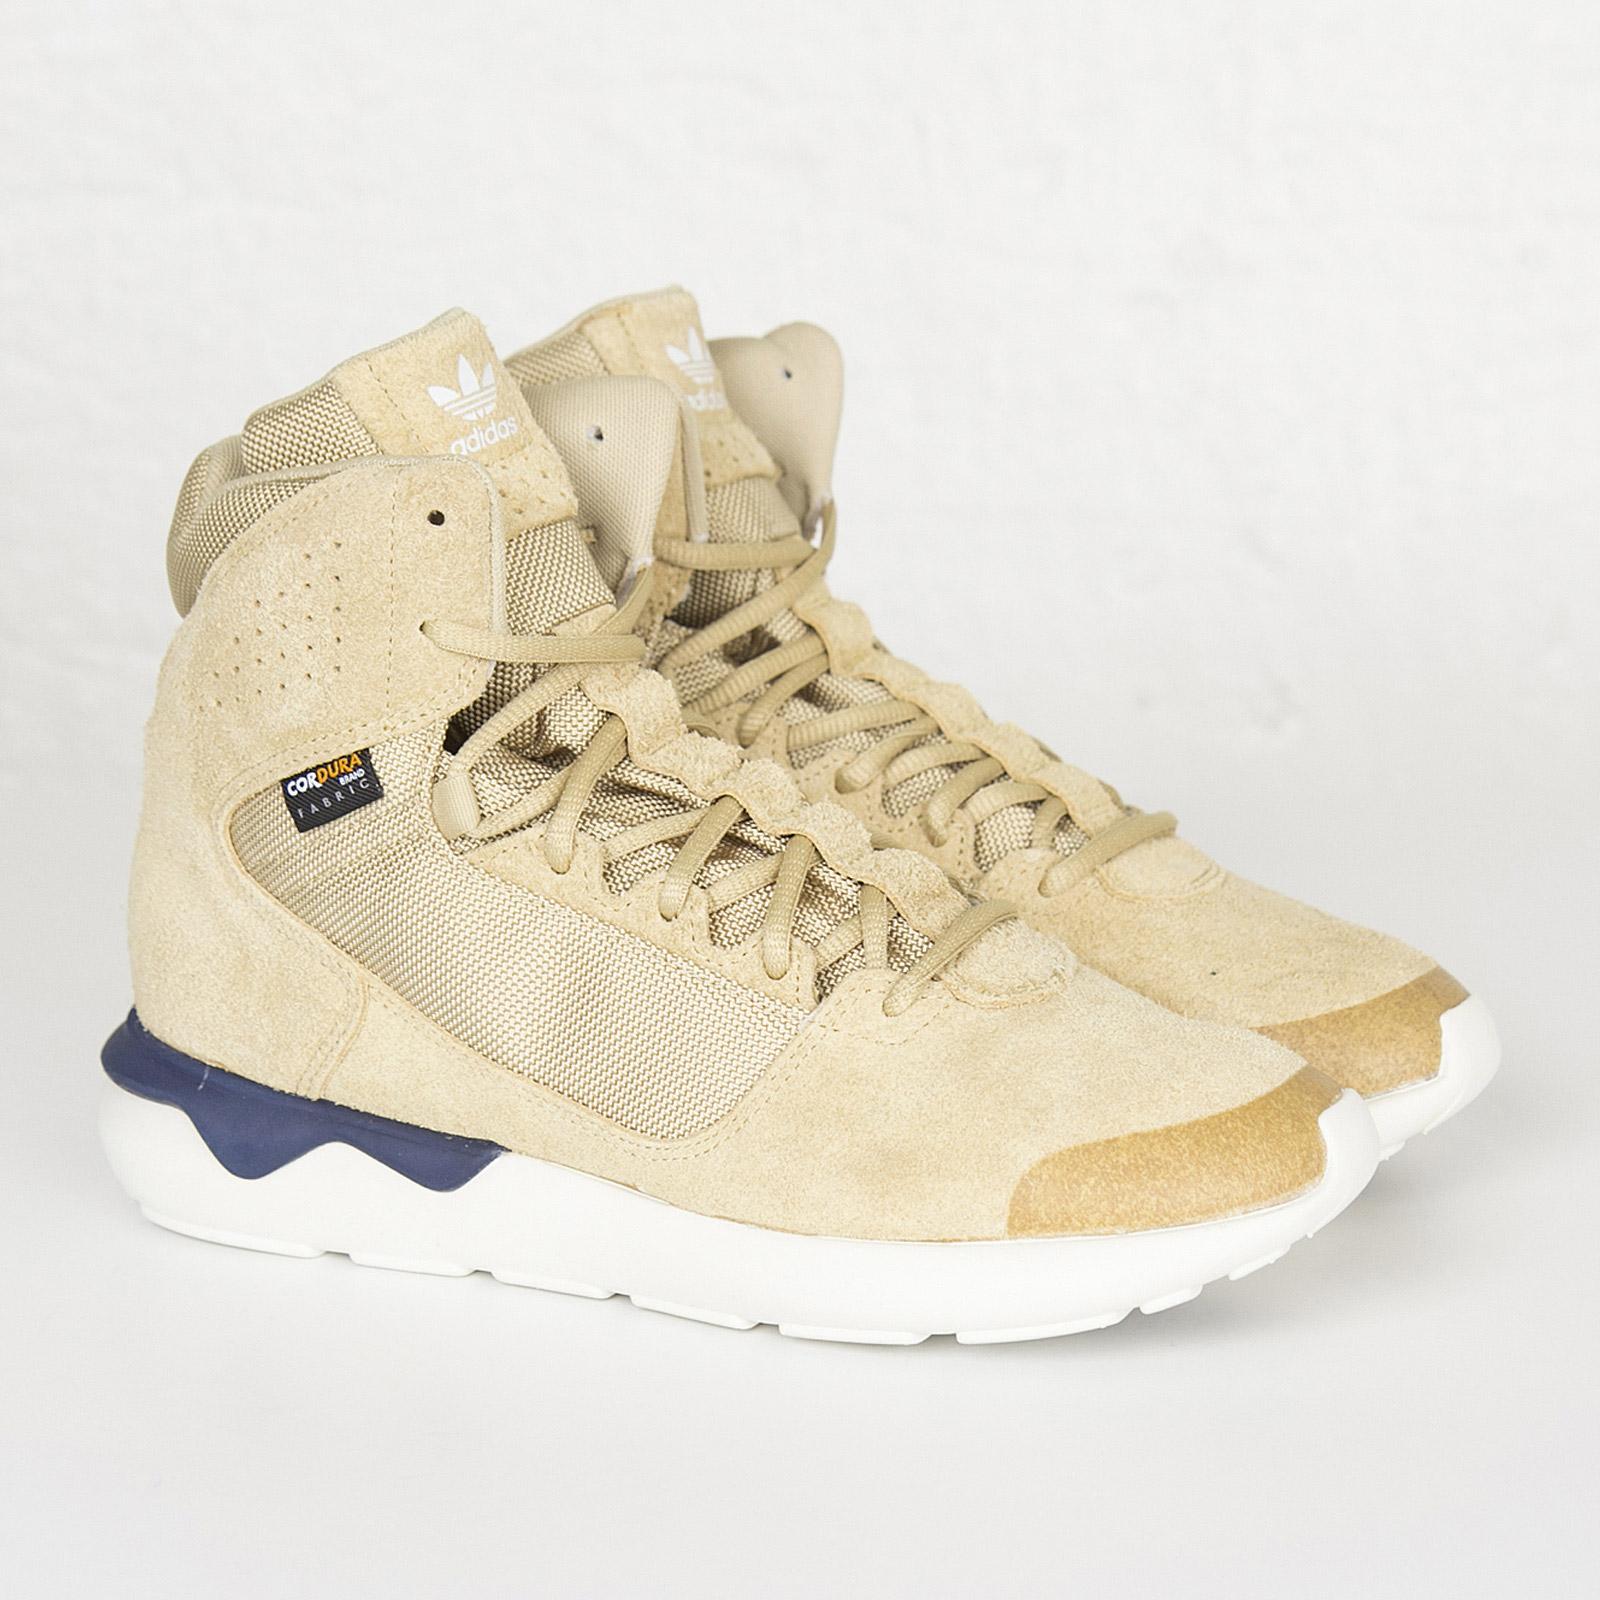 679f883fb991 adidas Tubular GSG9 - S82517 - Sneakersnstuff